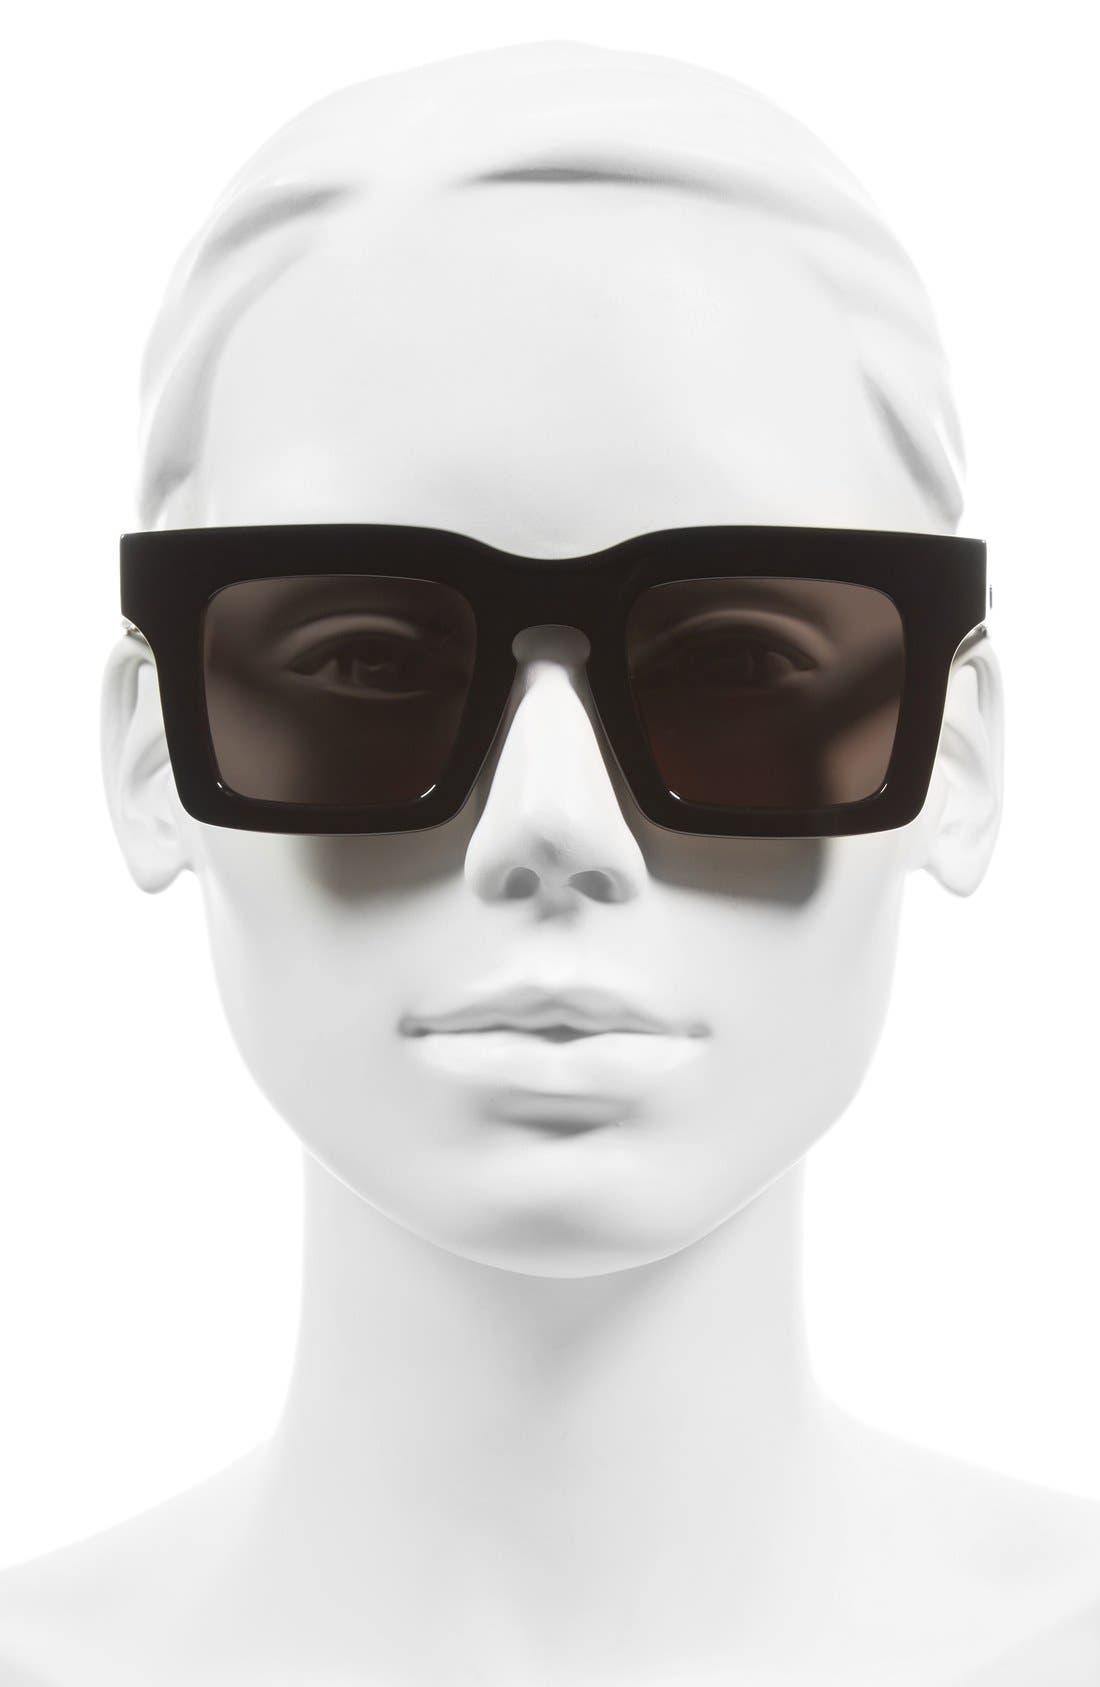 Ventricle 50mm Sunglasses,                             Alternate thumbnail 2, color,                             Gloss Black/ Tortoise